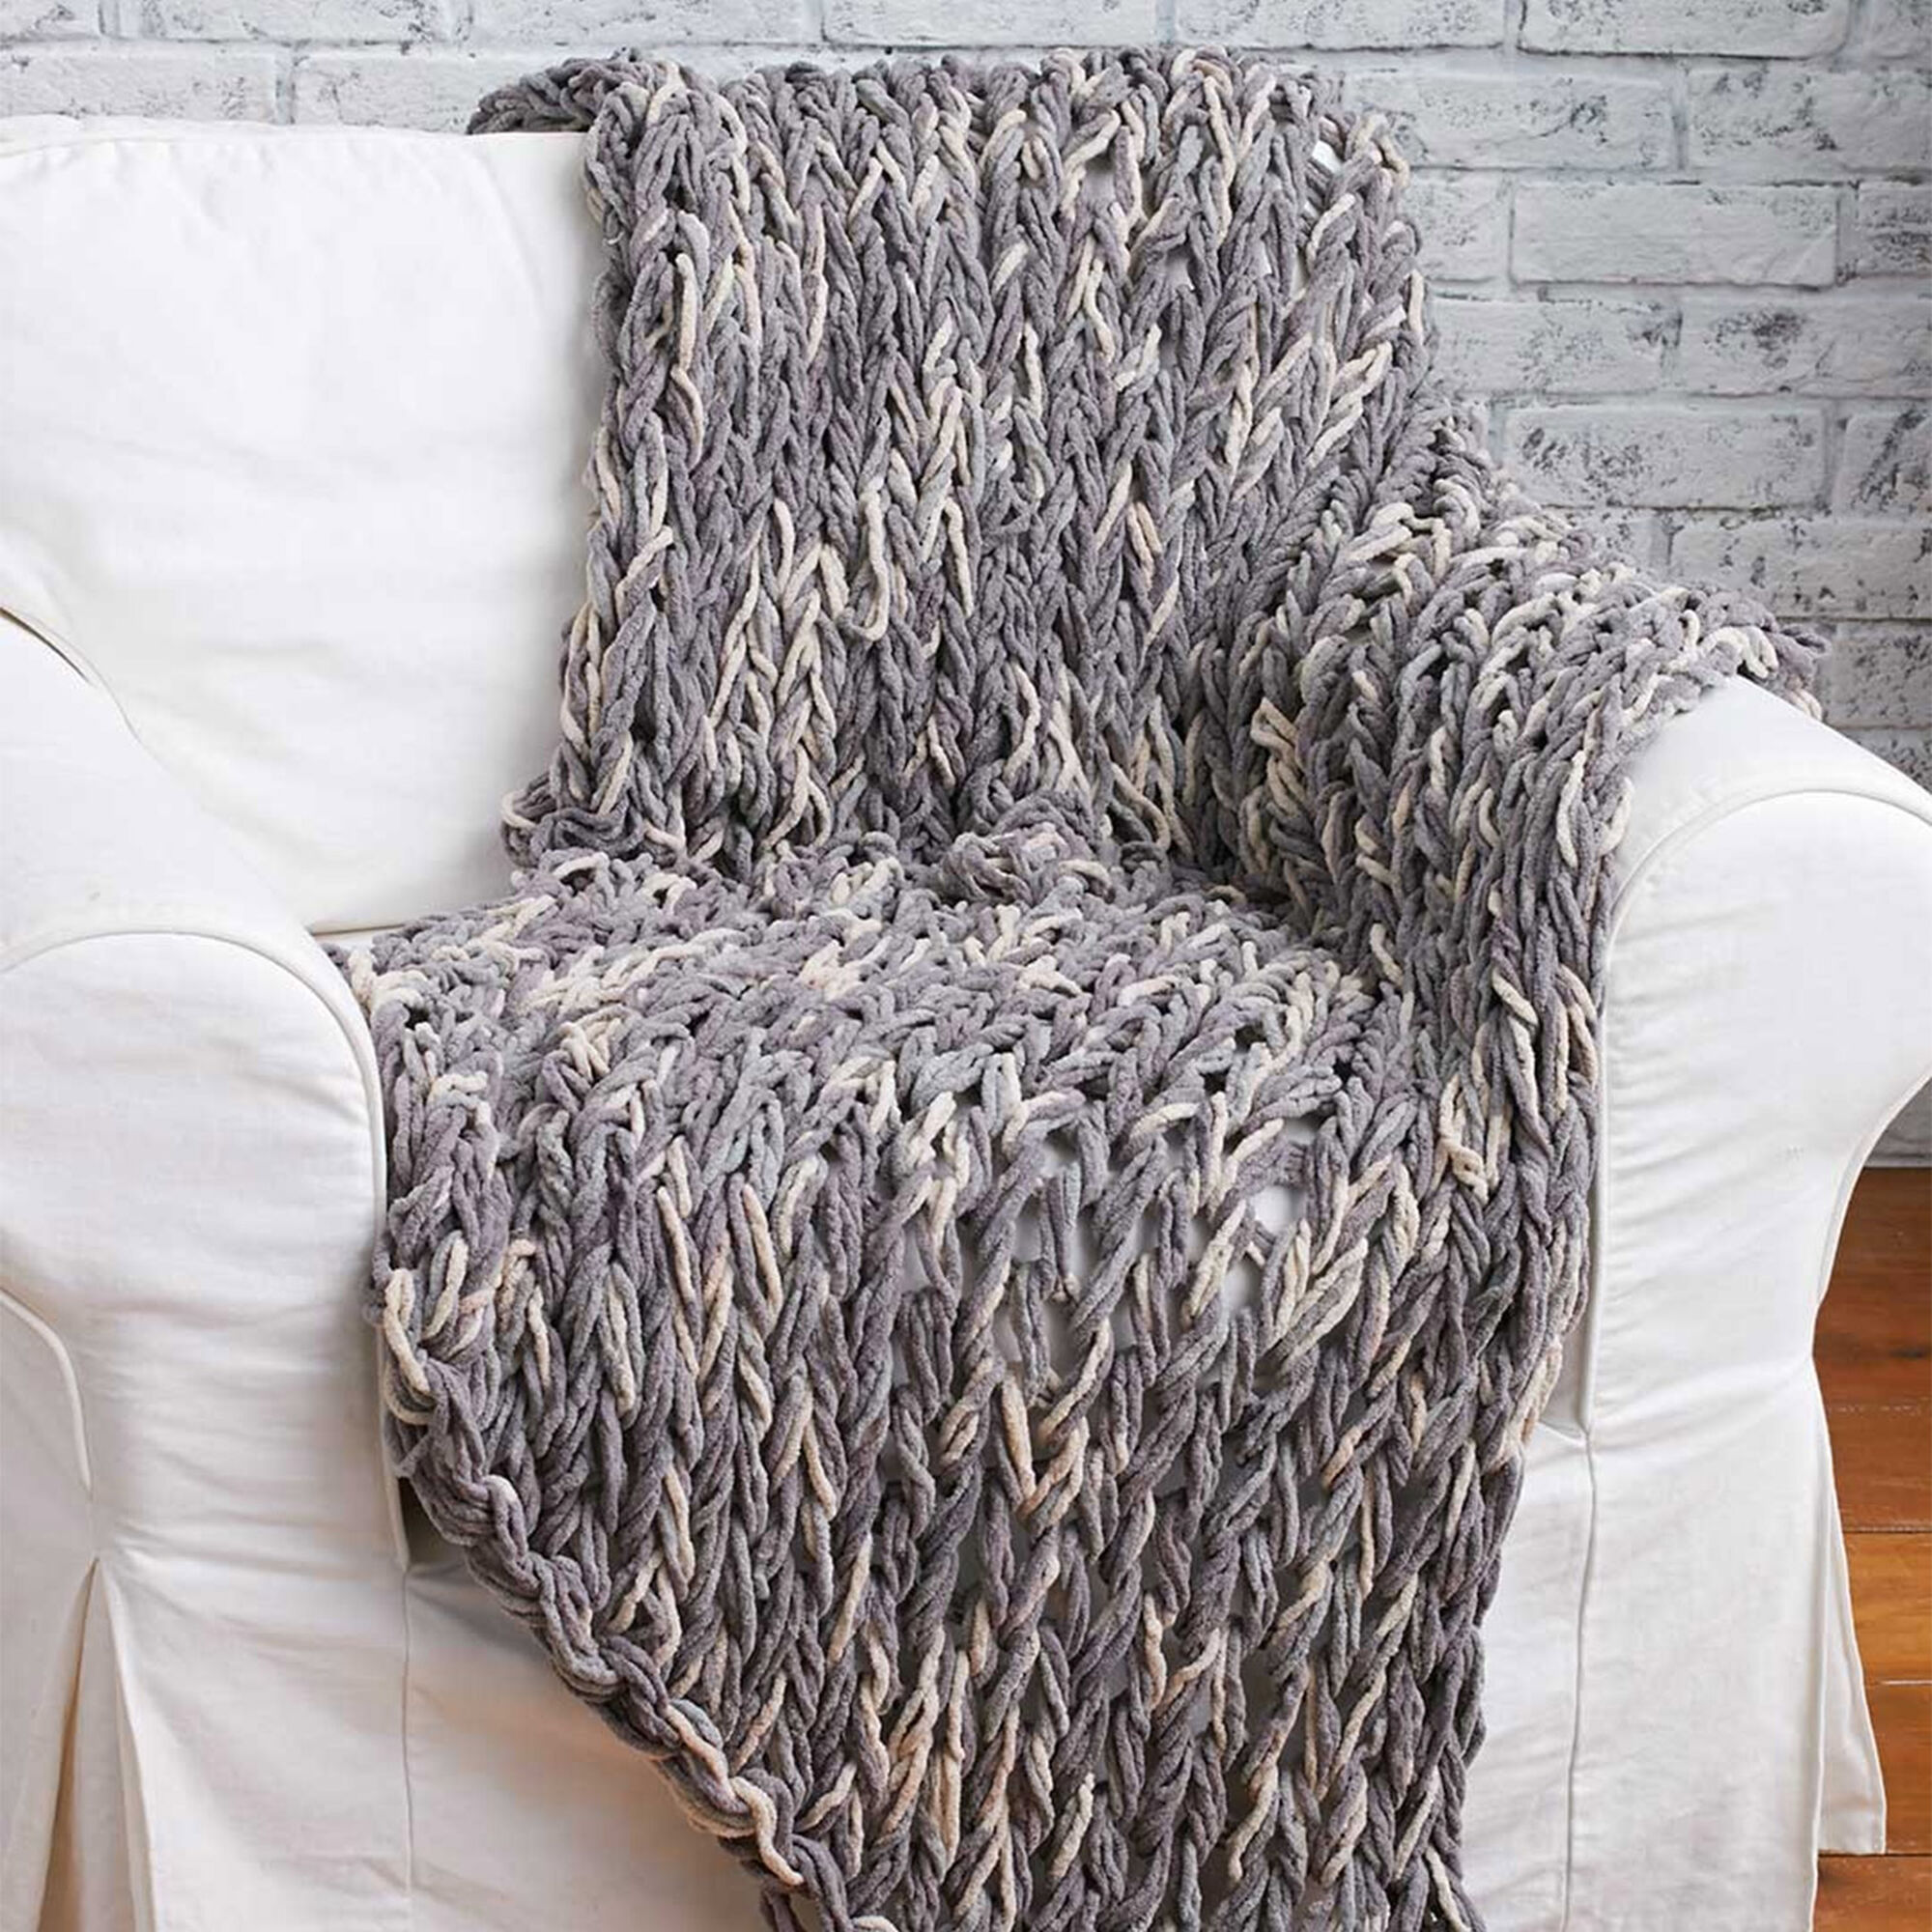 Bernat Arm Knit 3-Hour Blanket   Yarnspirations